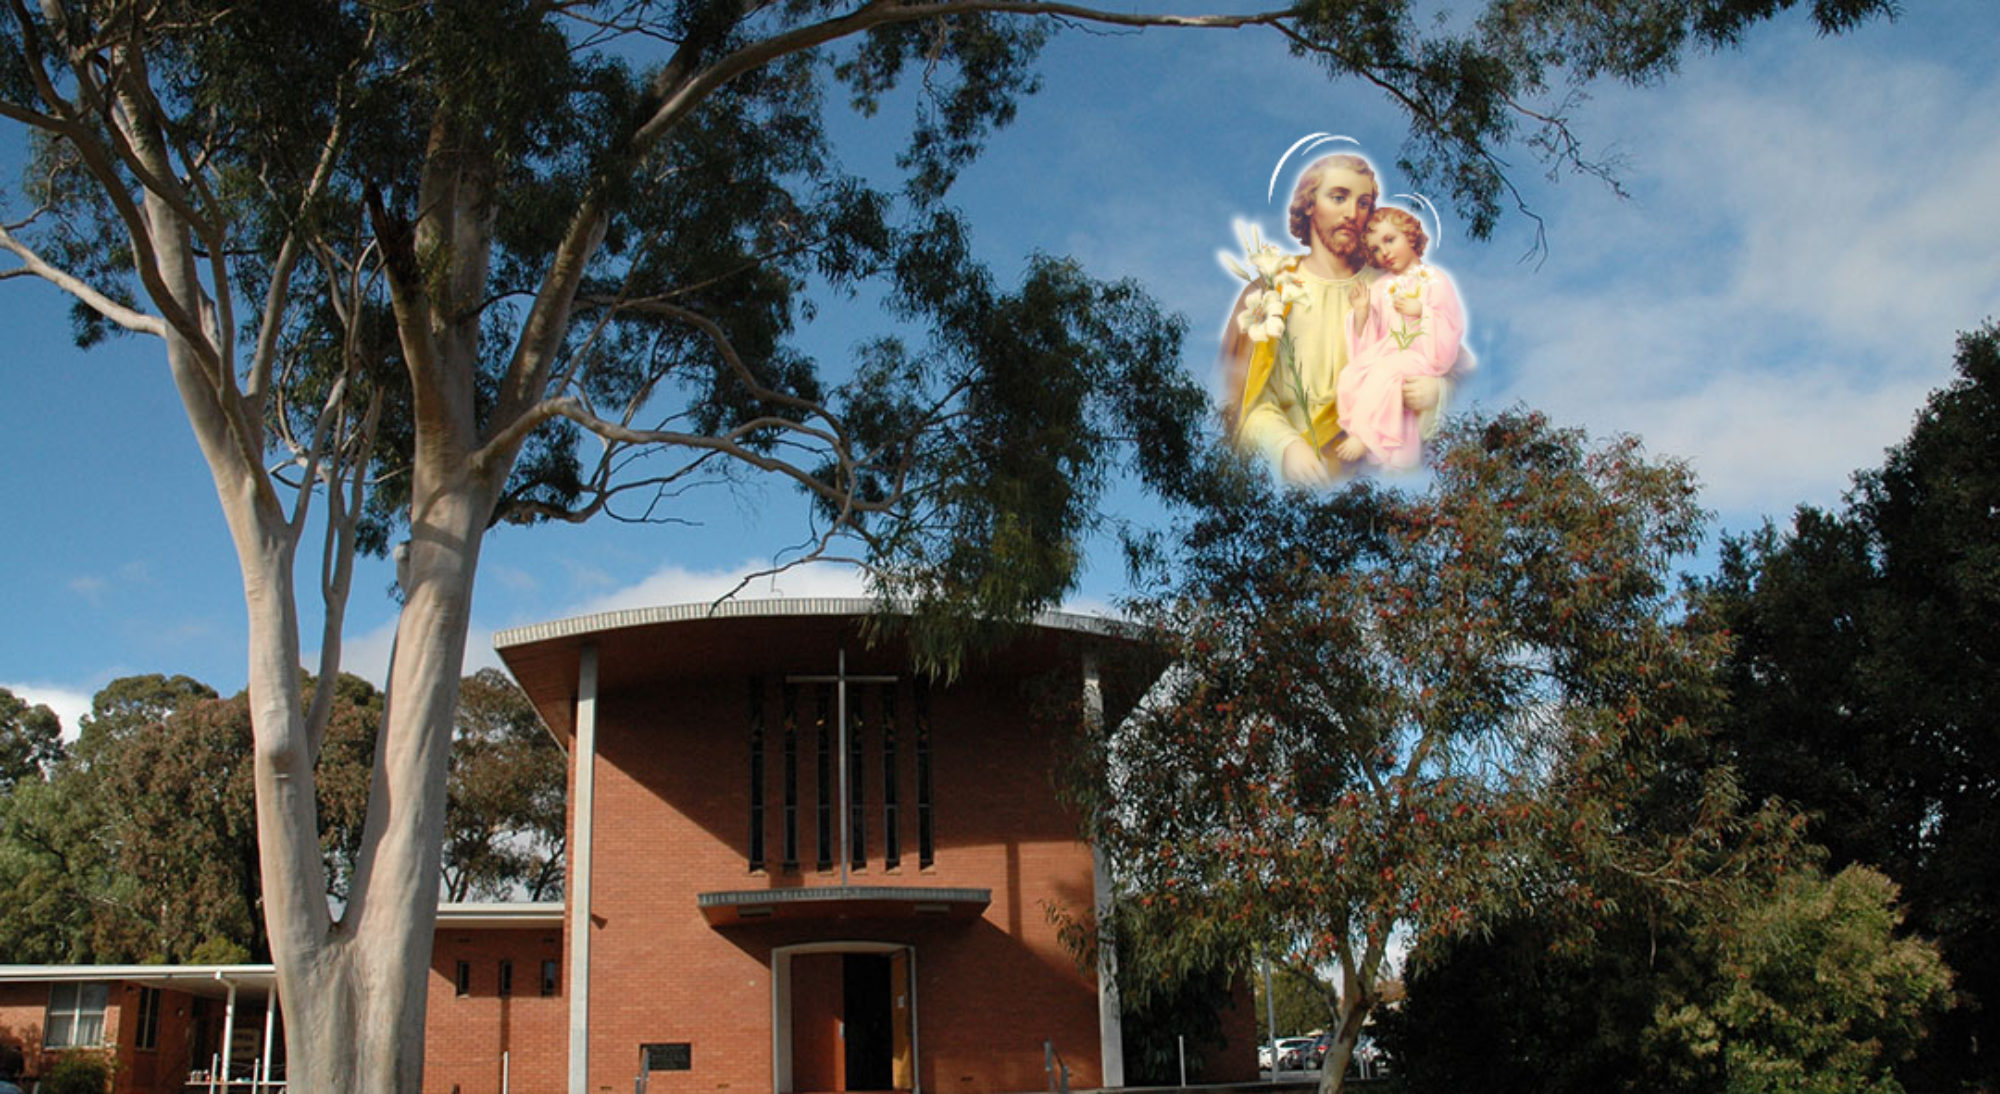 St Joseph's Church Tranmere